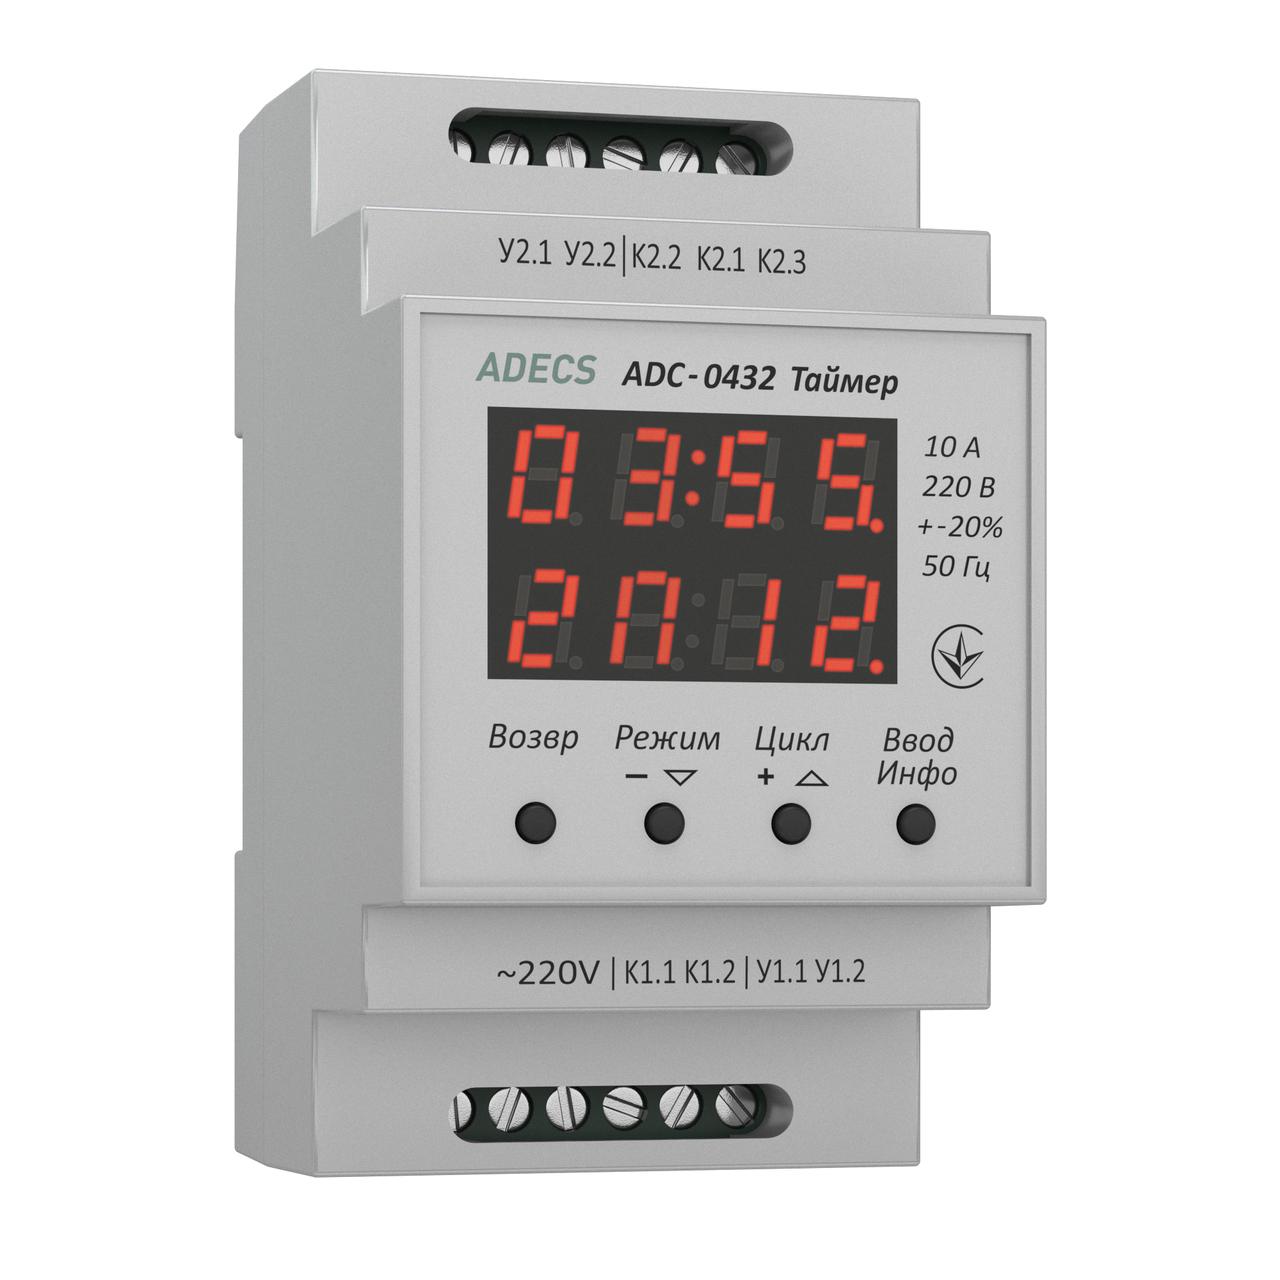 Таймер циклический ADC-0432 (реле времени)